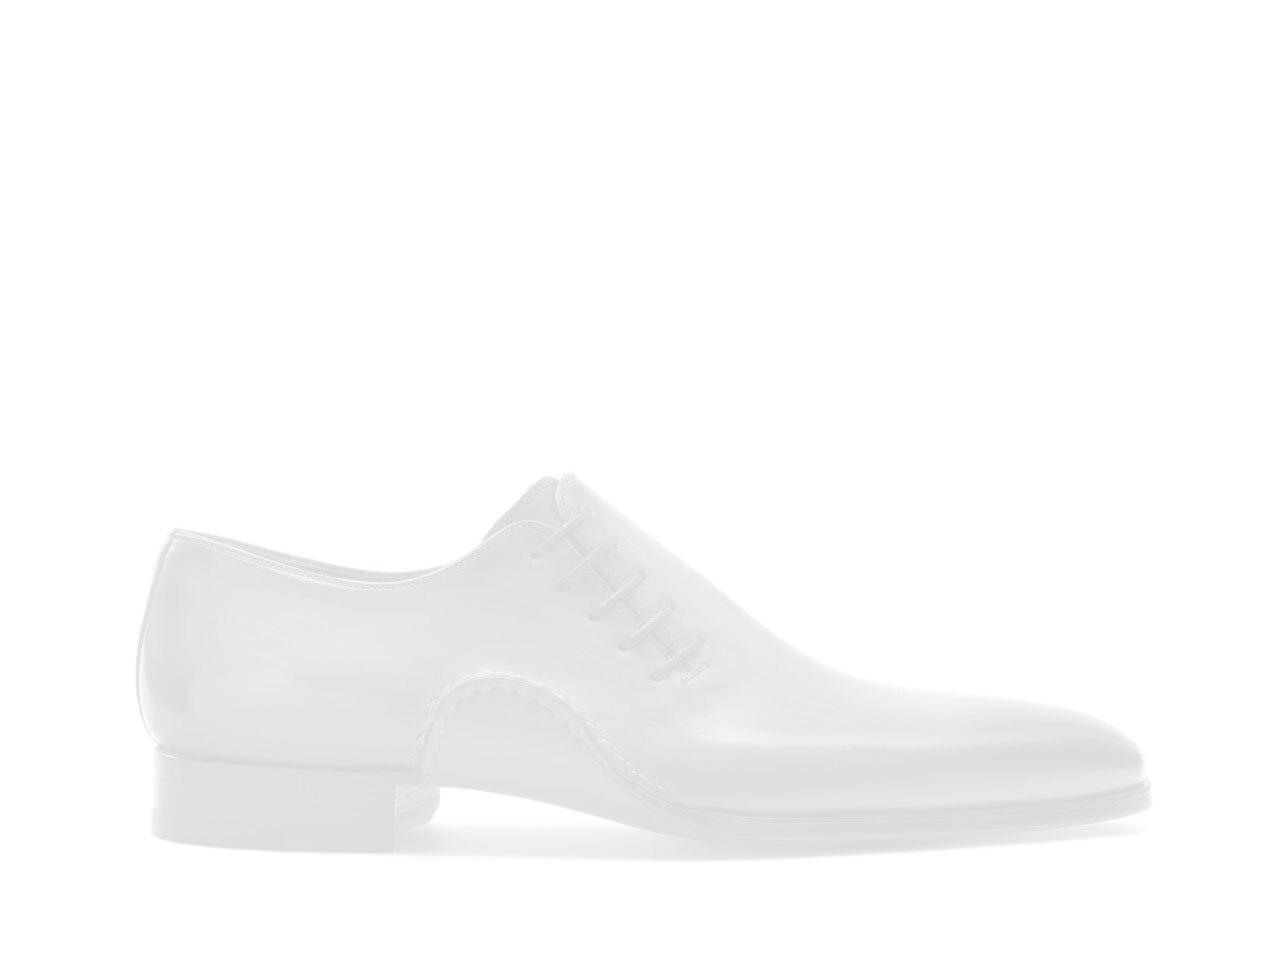 Sole of the Magnanni Saffron Cuero Men's Oxford Shoes